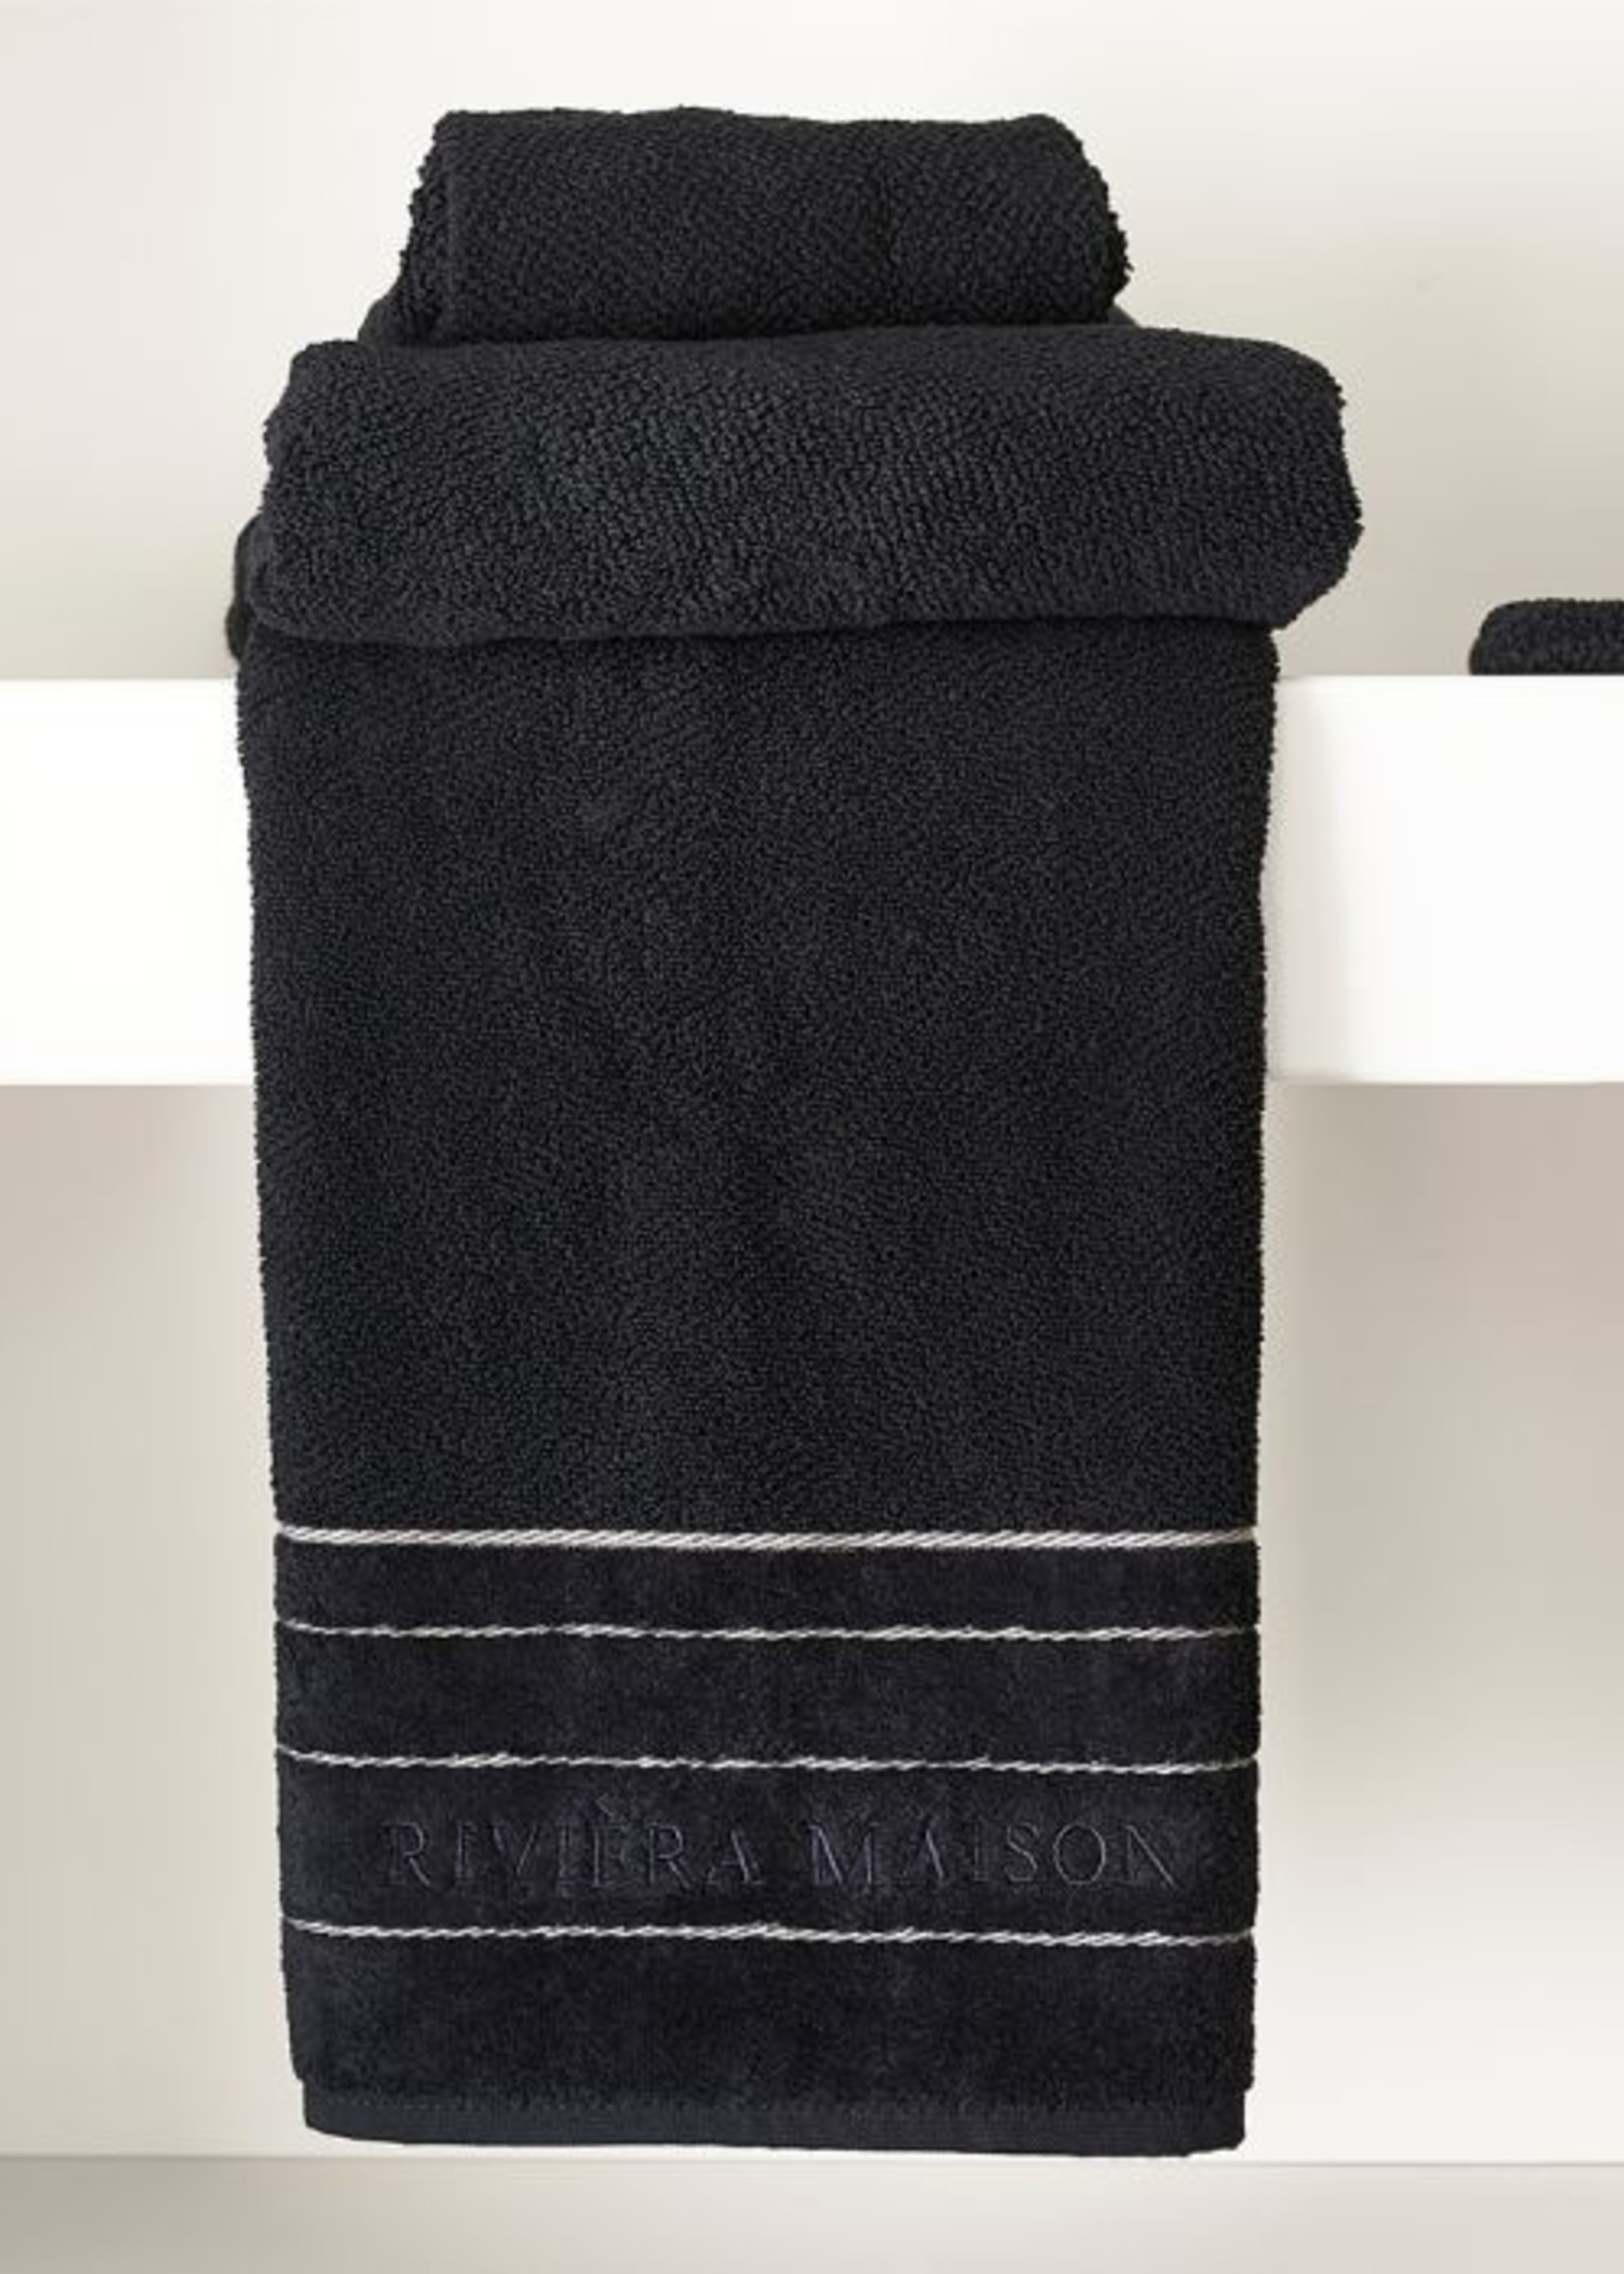 Riviera Maison RM Elegant Towel black 100x50